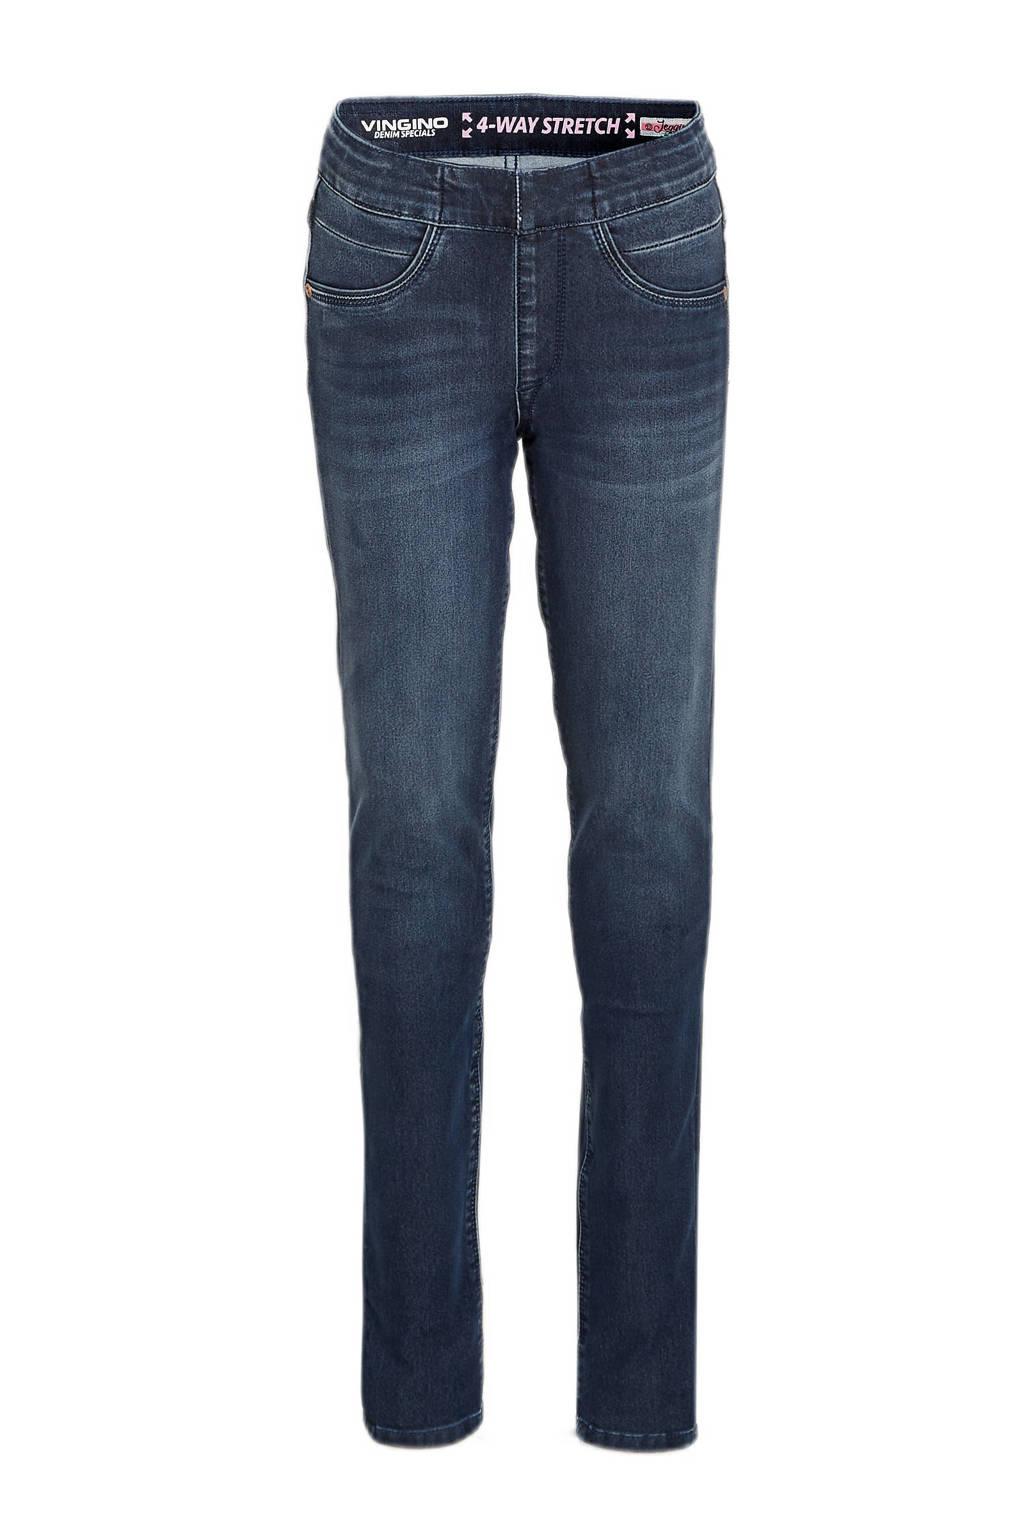 Vingino low waist super skinny jeans Bibine blue vintage